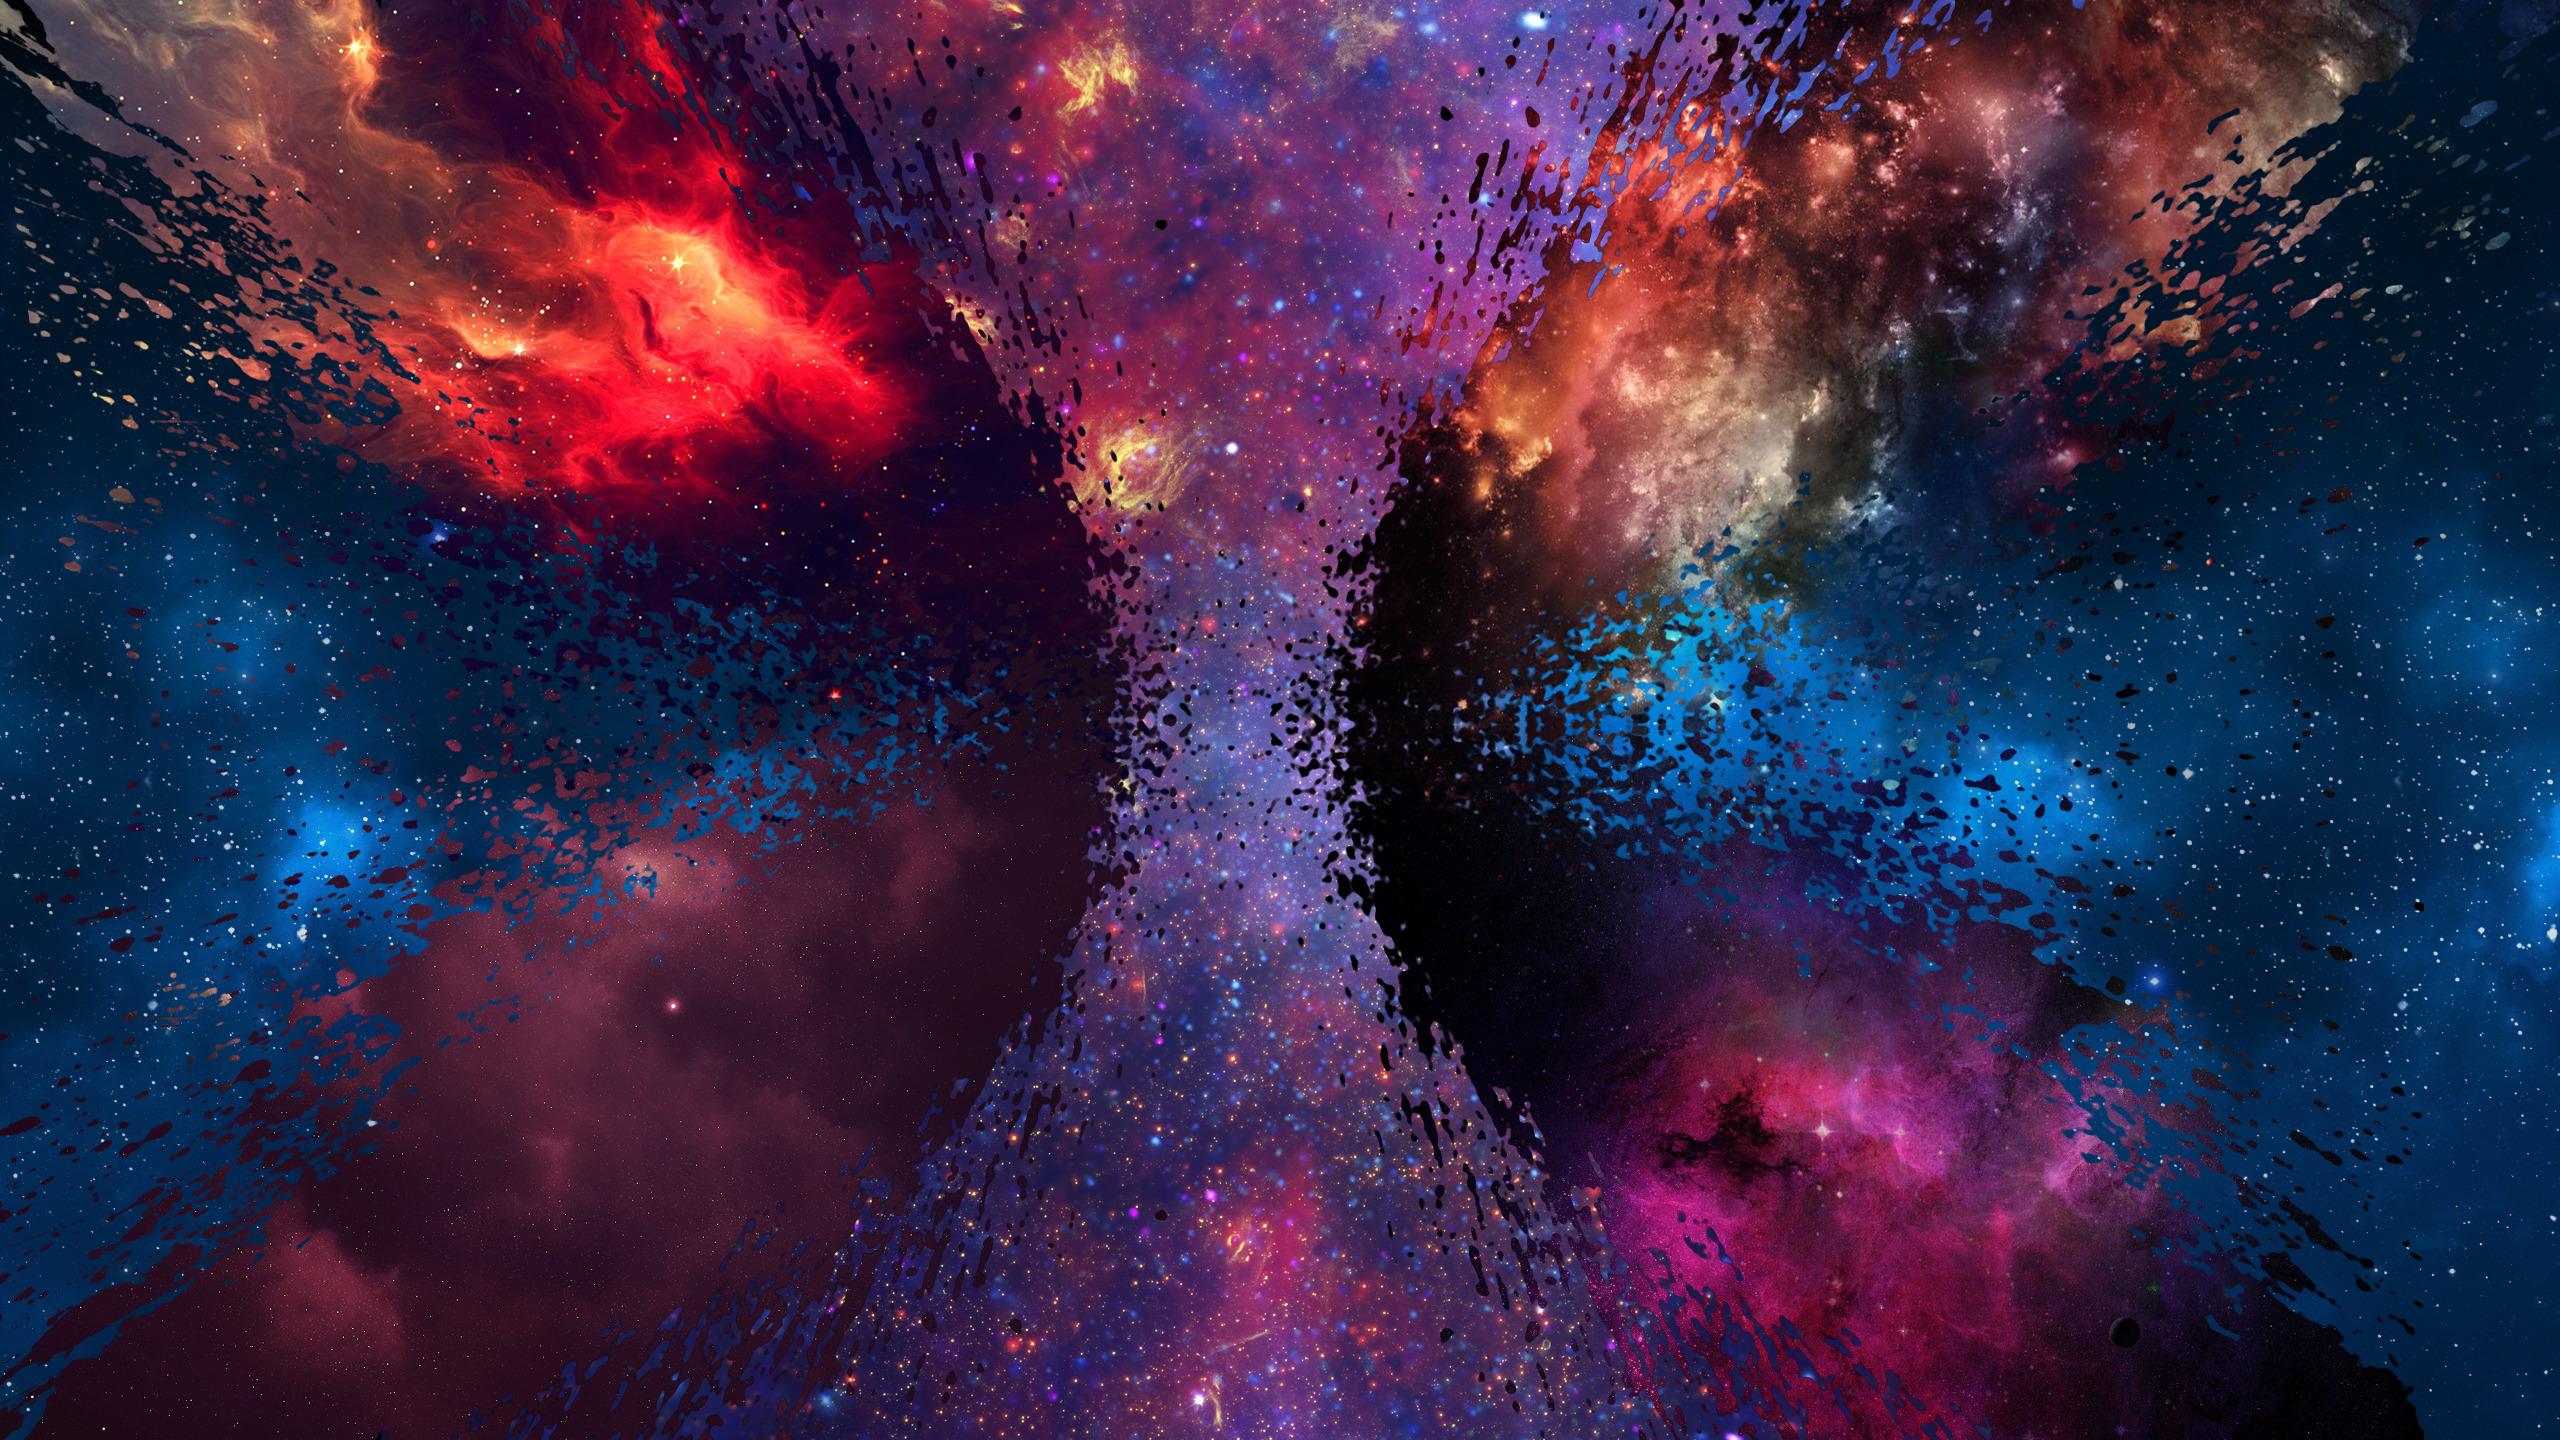 Galaxy Universe Wallpaper Space 2560x1440 Download Hd Wallpaper Wallpapertip